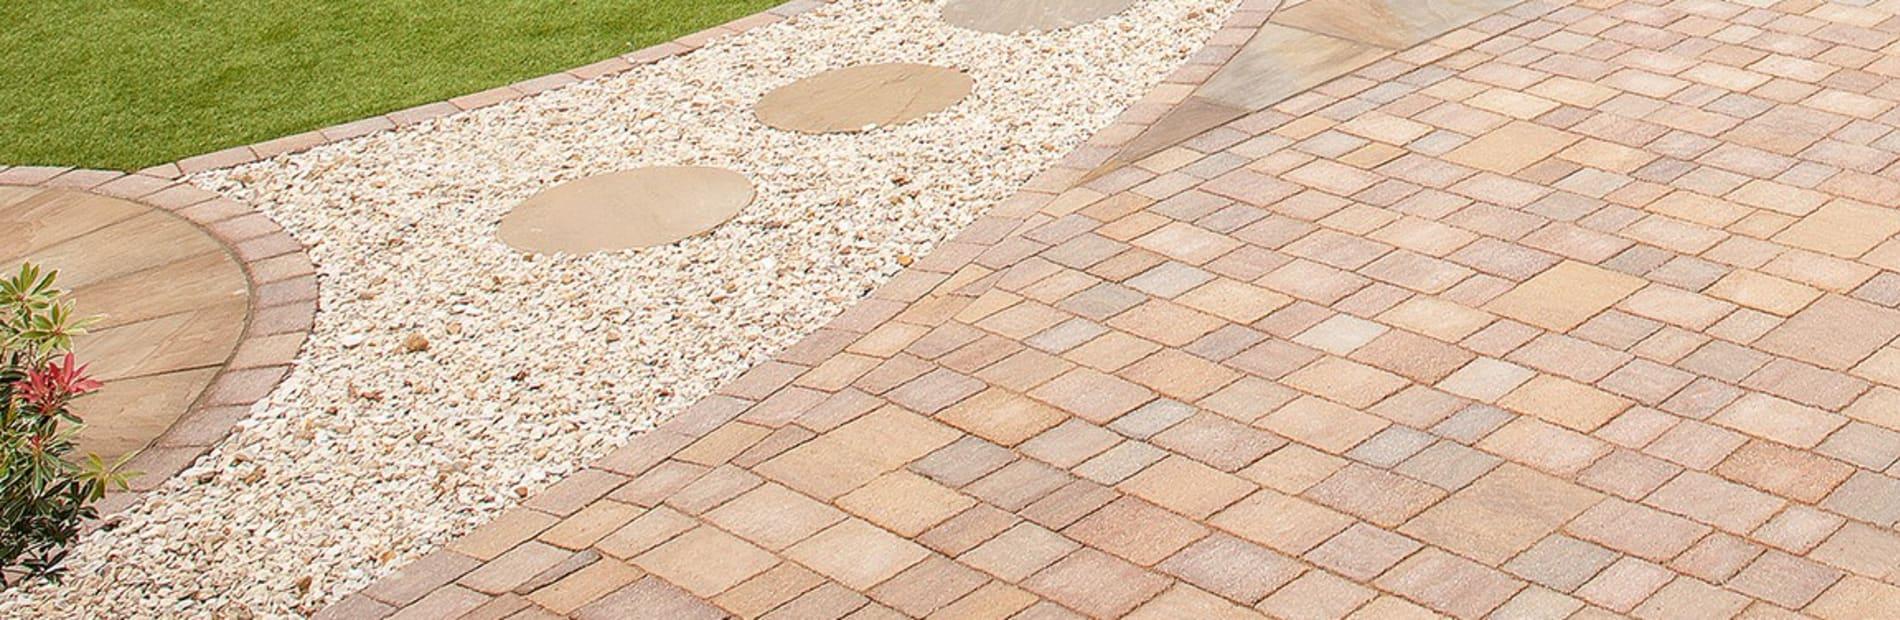 Standard Concrete Block Paving hero image